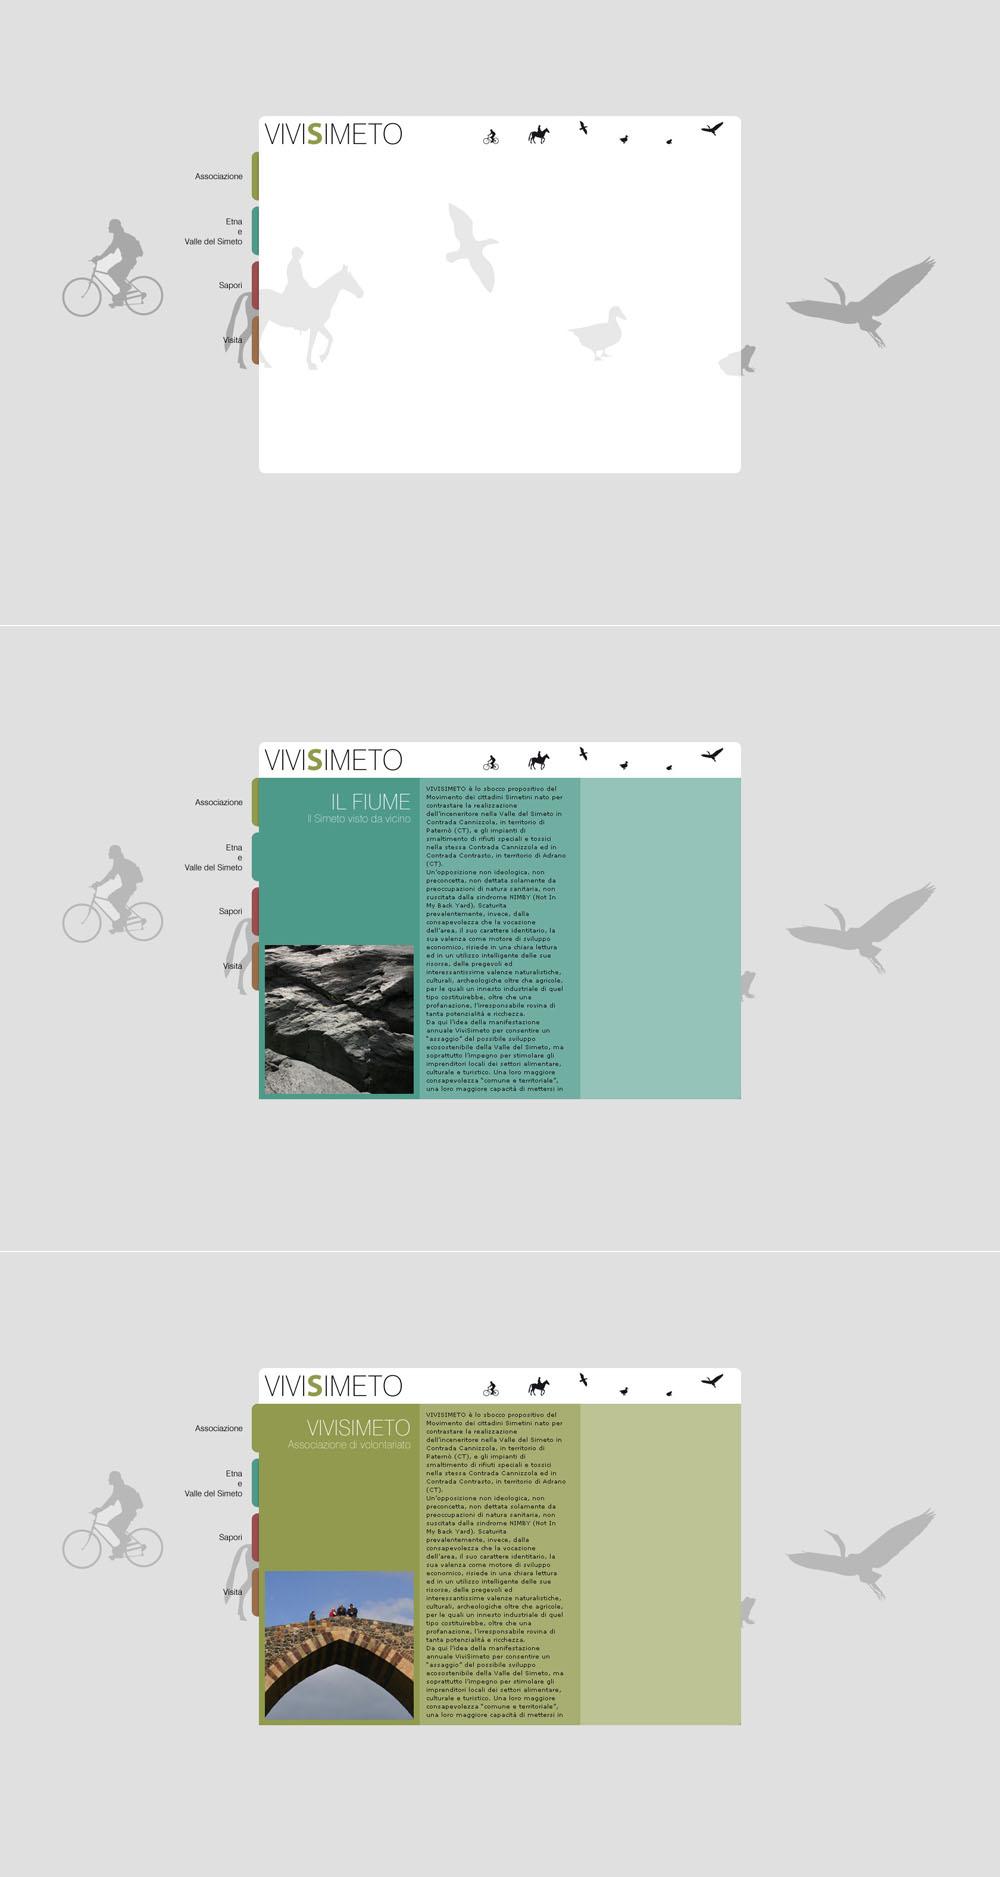 Vivisimeto web by ficod